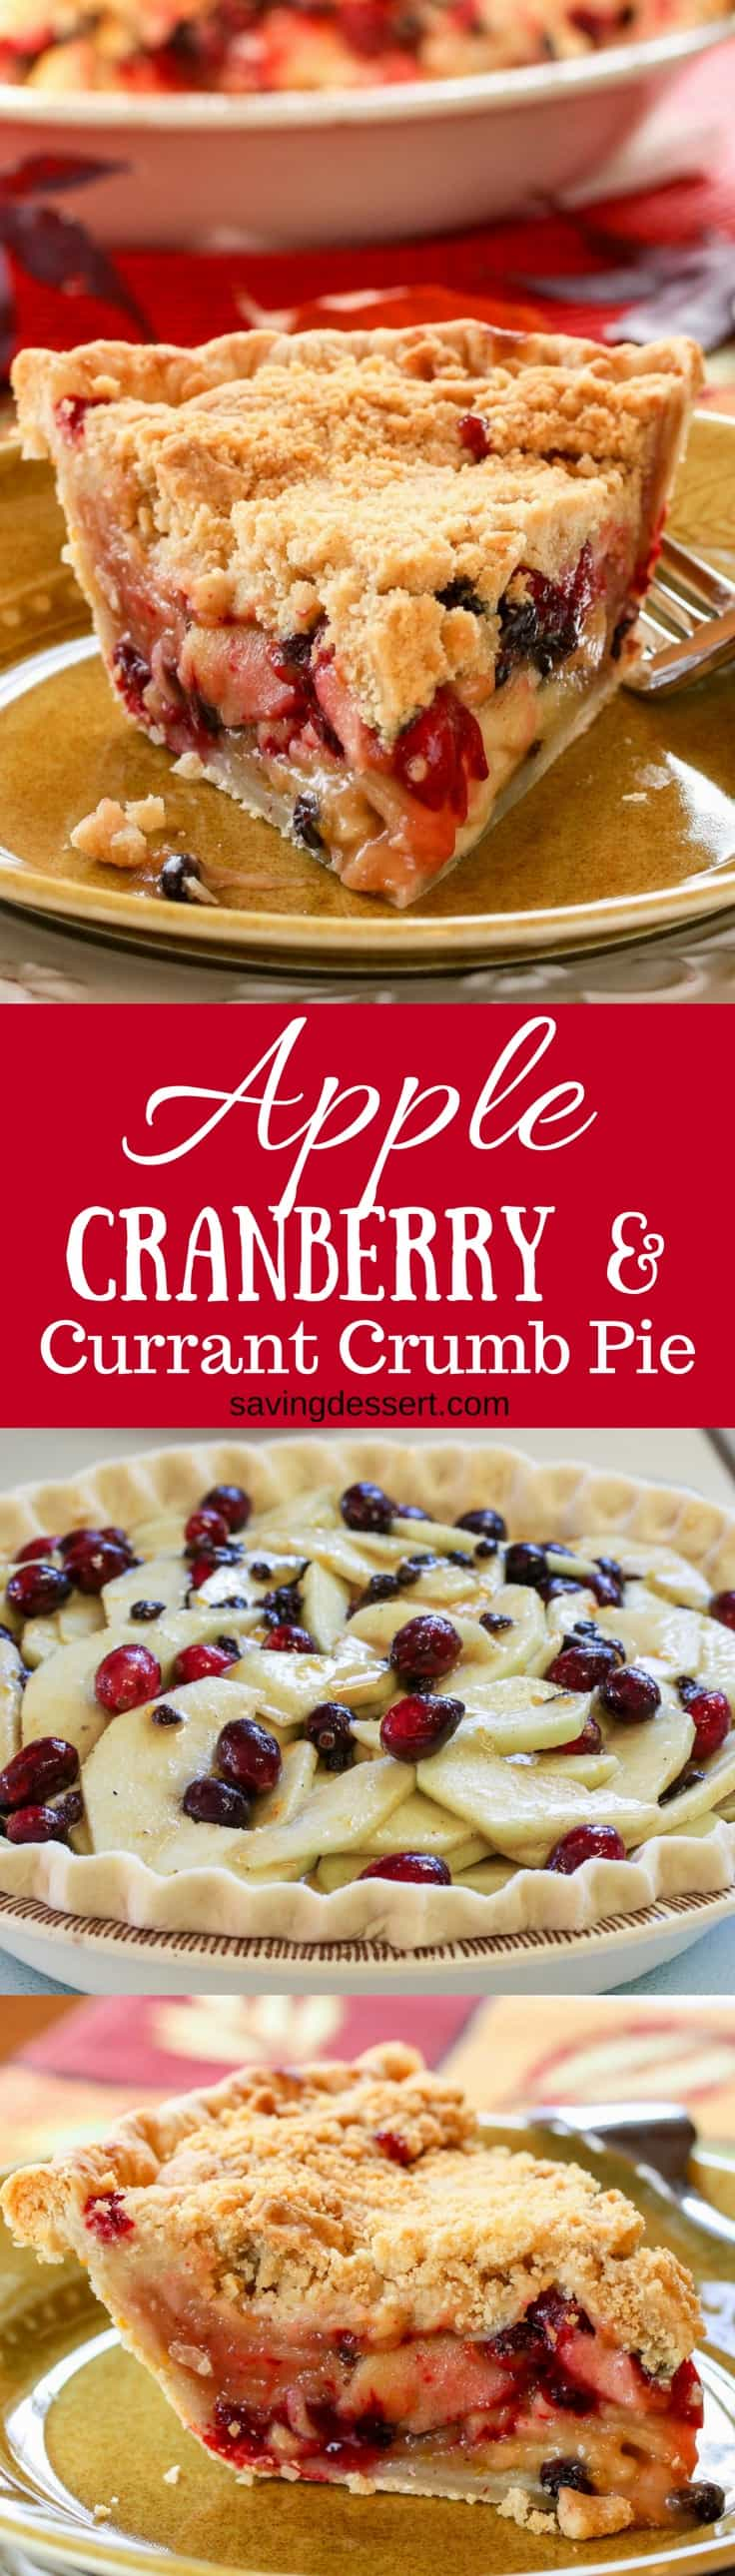 Apple, Cranberry & Currant Crumb Pie | www.savingdessert.com #pie #applepie #cranberry #Crumbpie